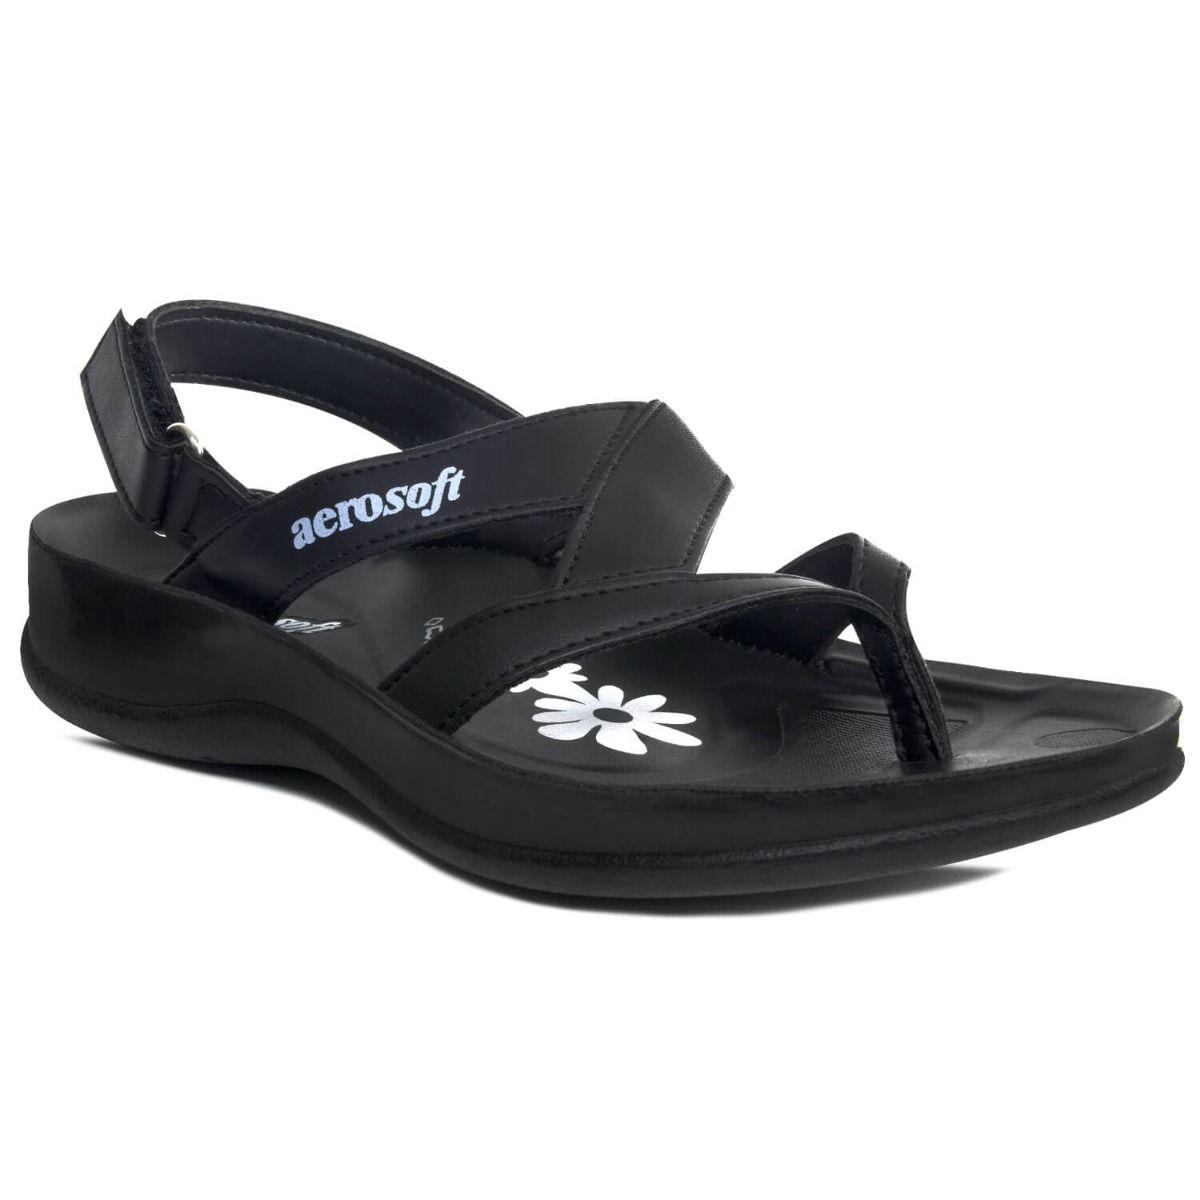 Deke - Women's Slingback Sandals -